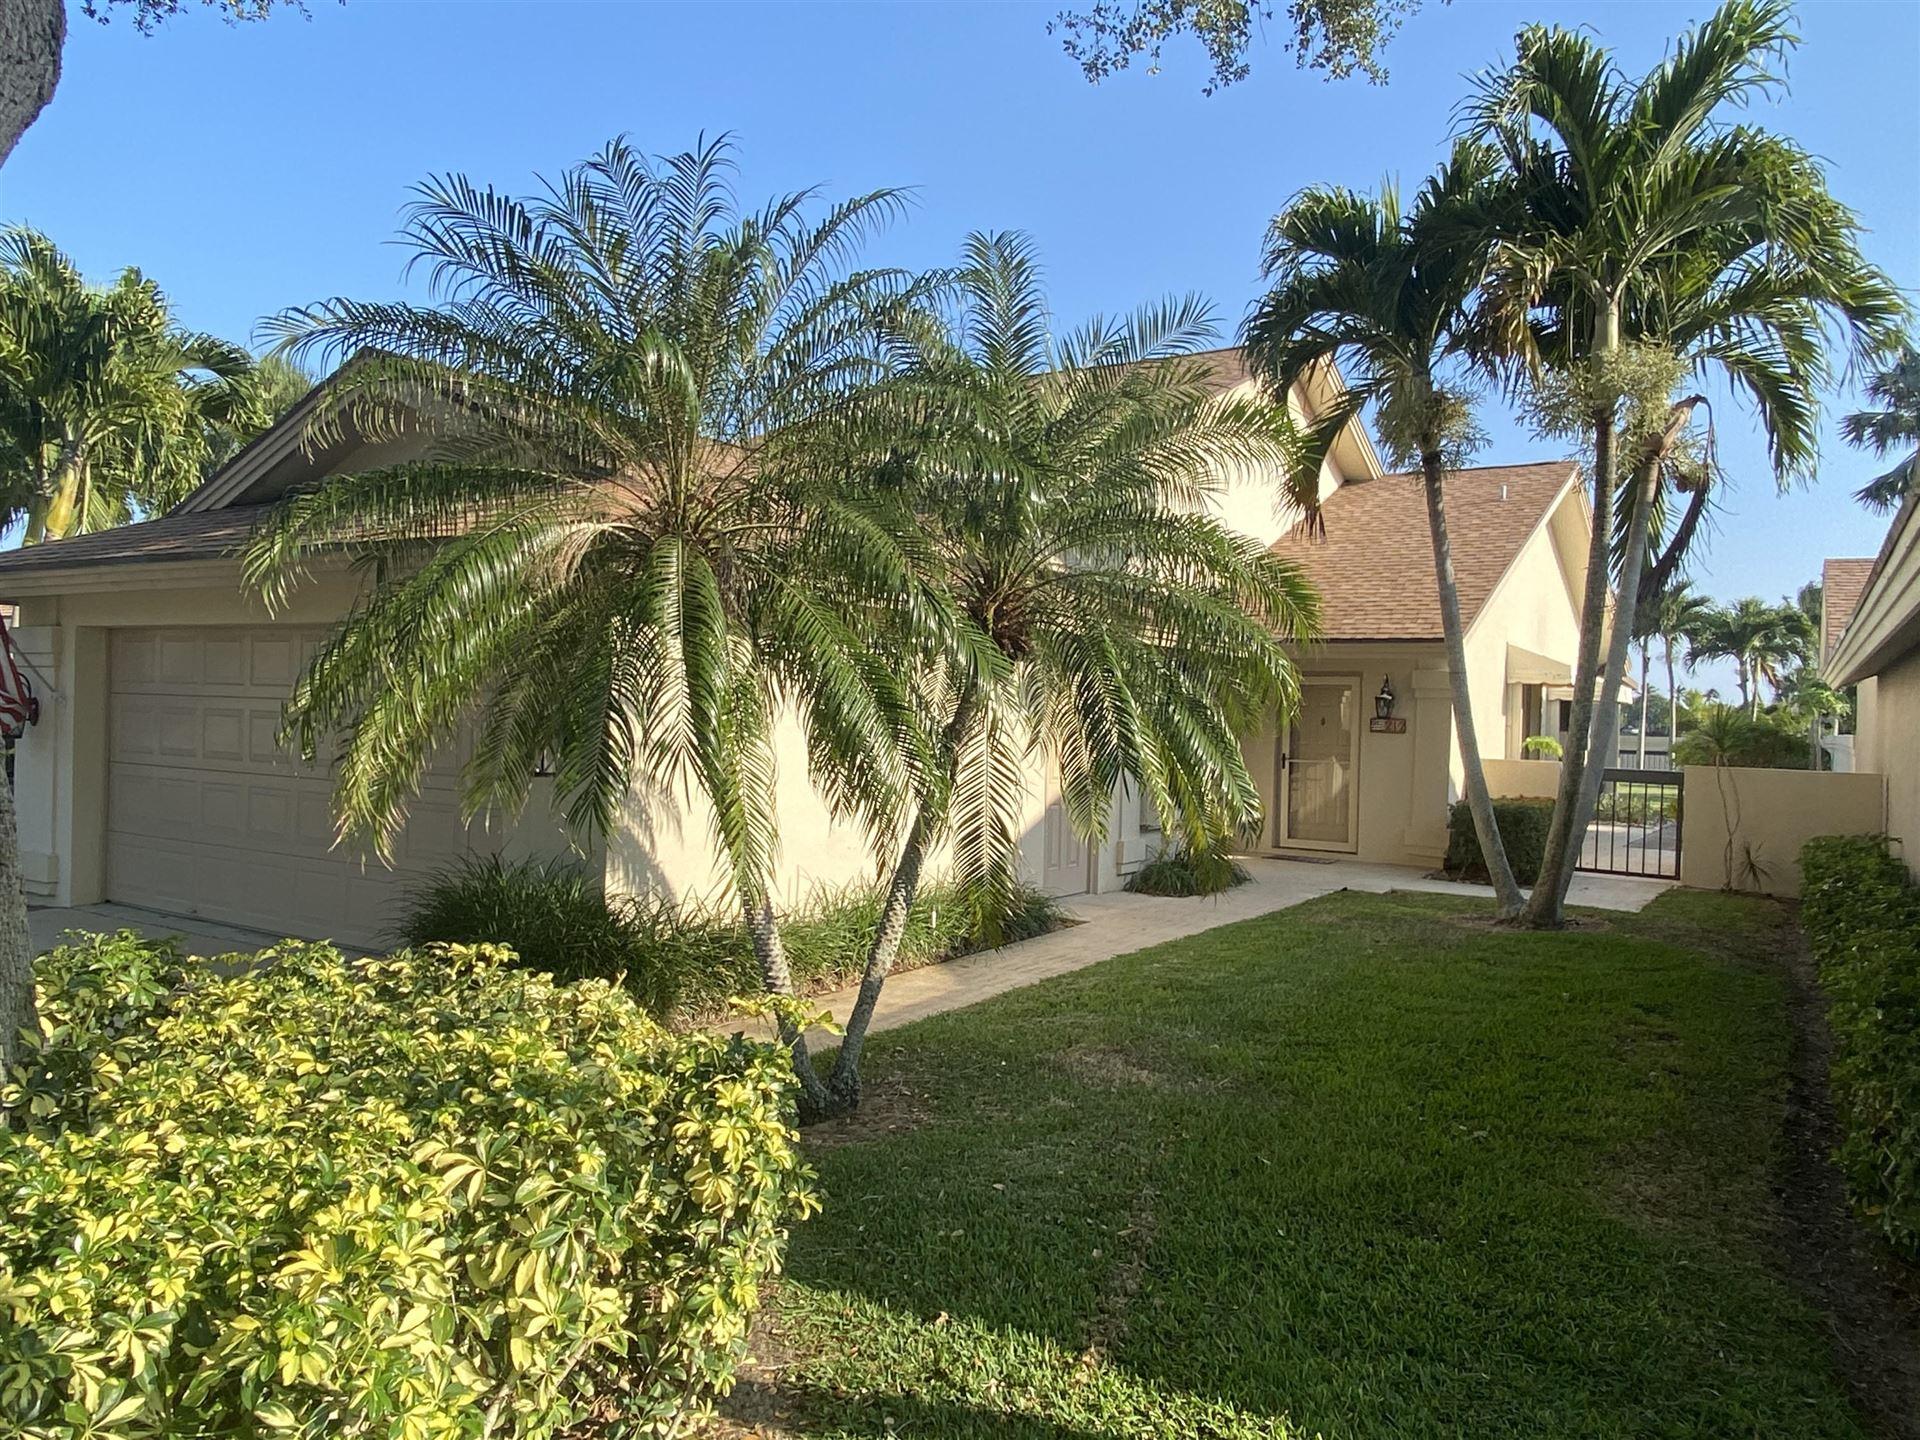 Photo of 212 St Charles Court, Jupiter, FL 33477 (MLS # RX-10702808)